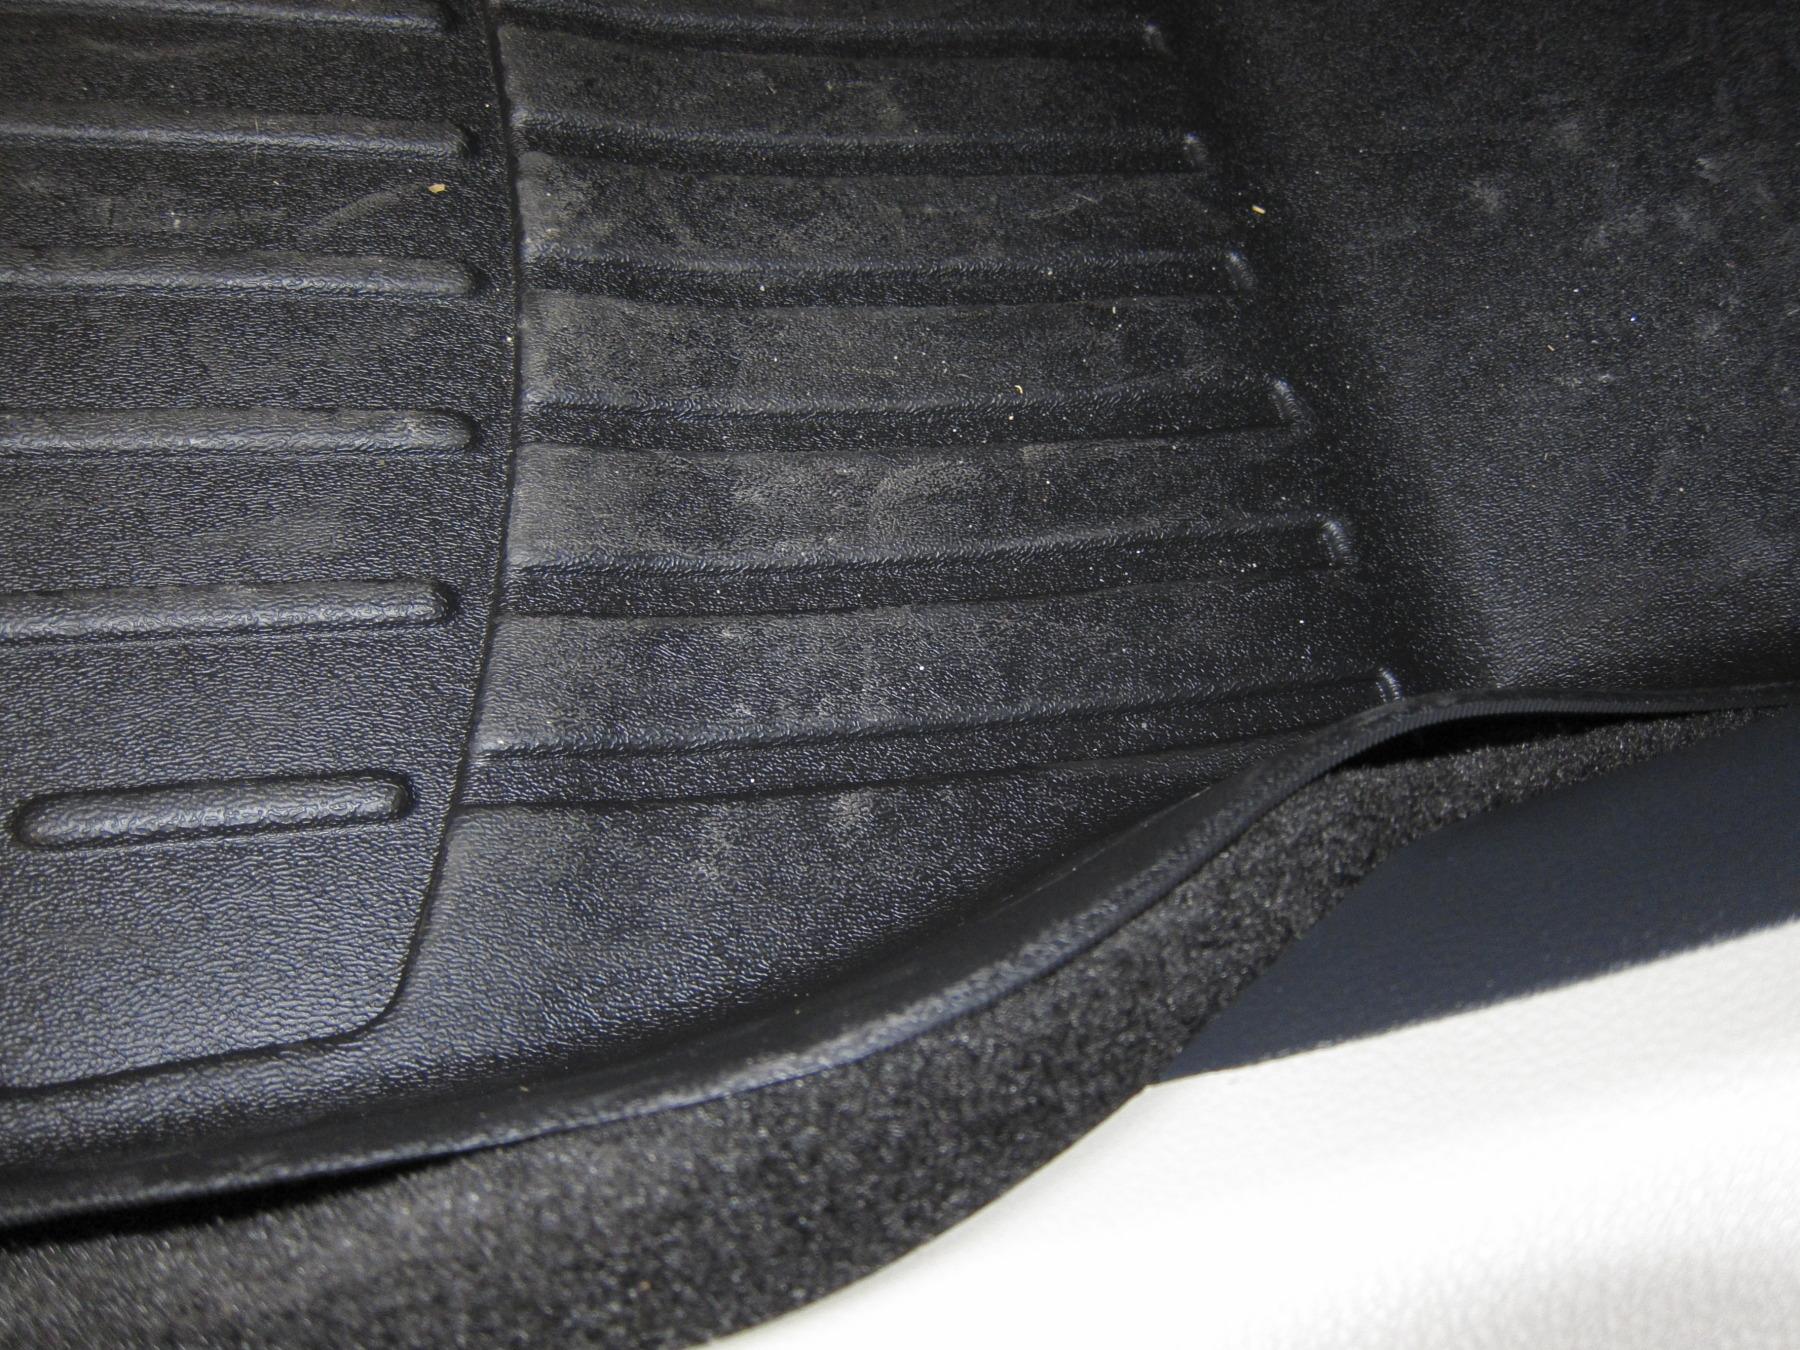 2012 outback weathertech floor mats help